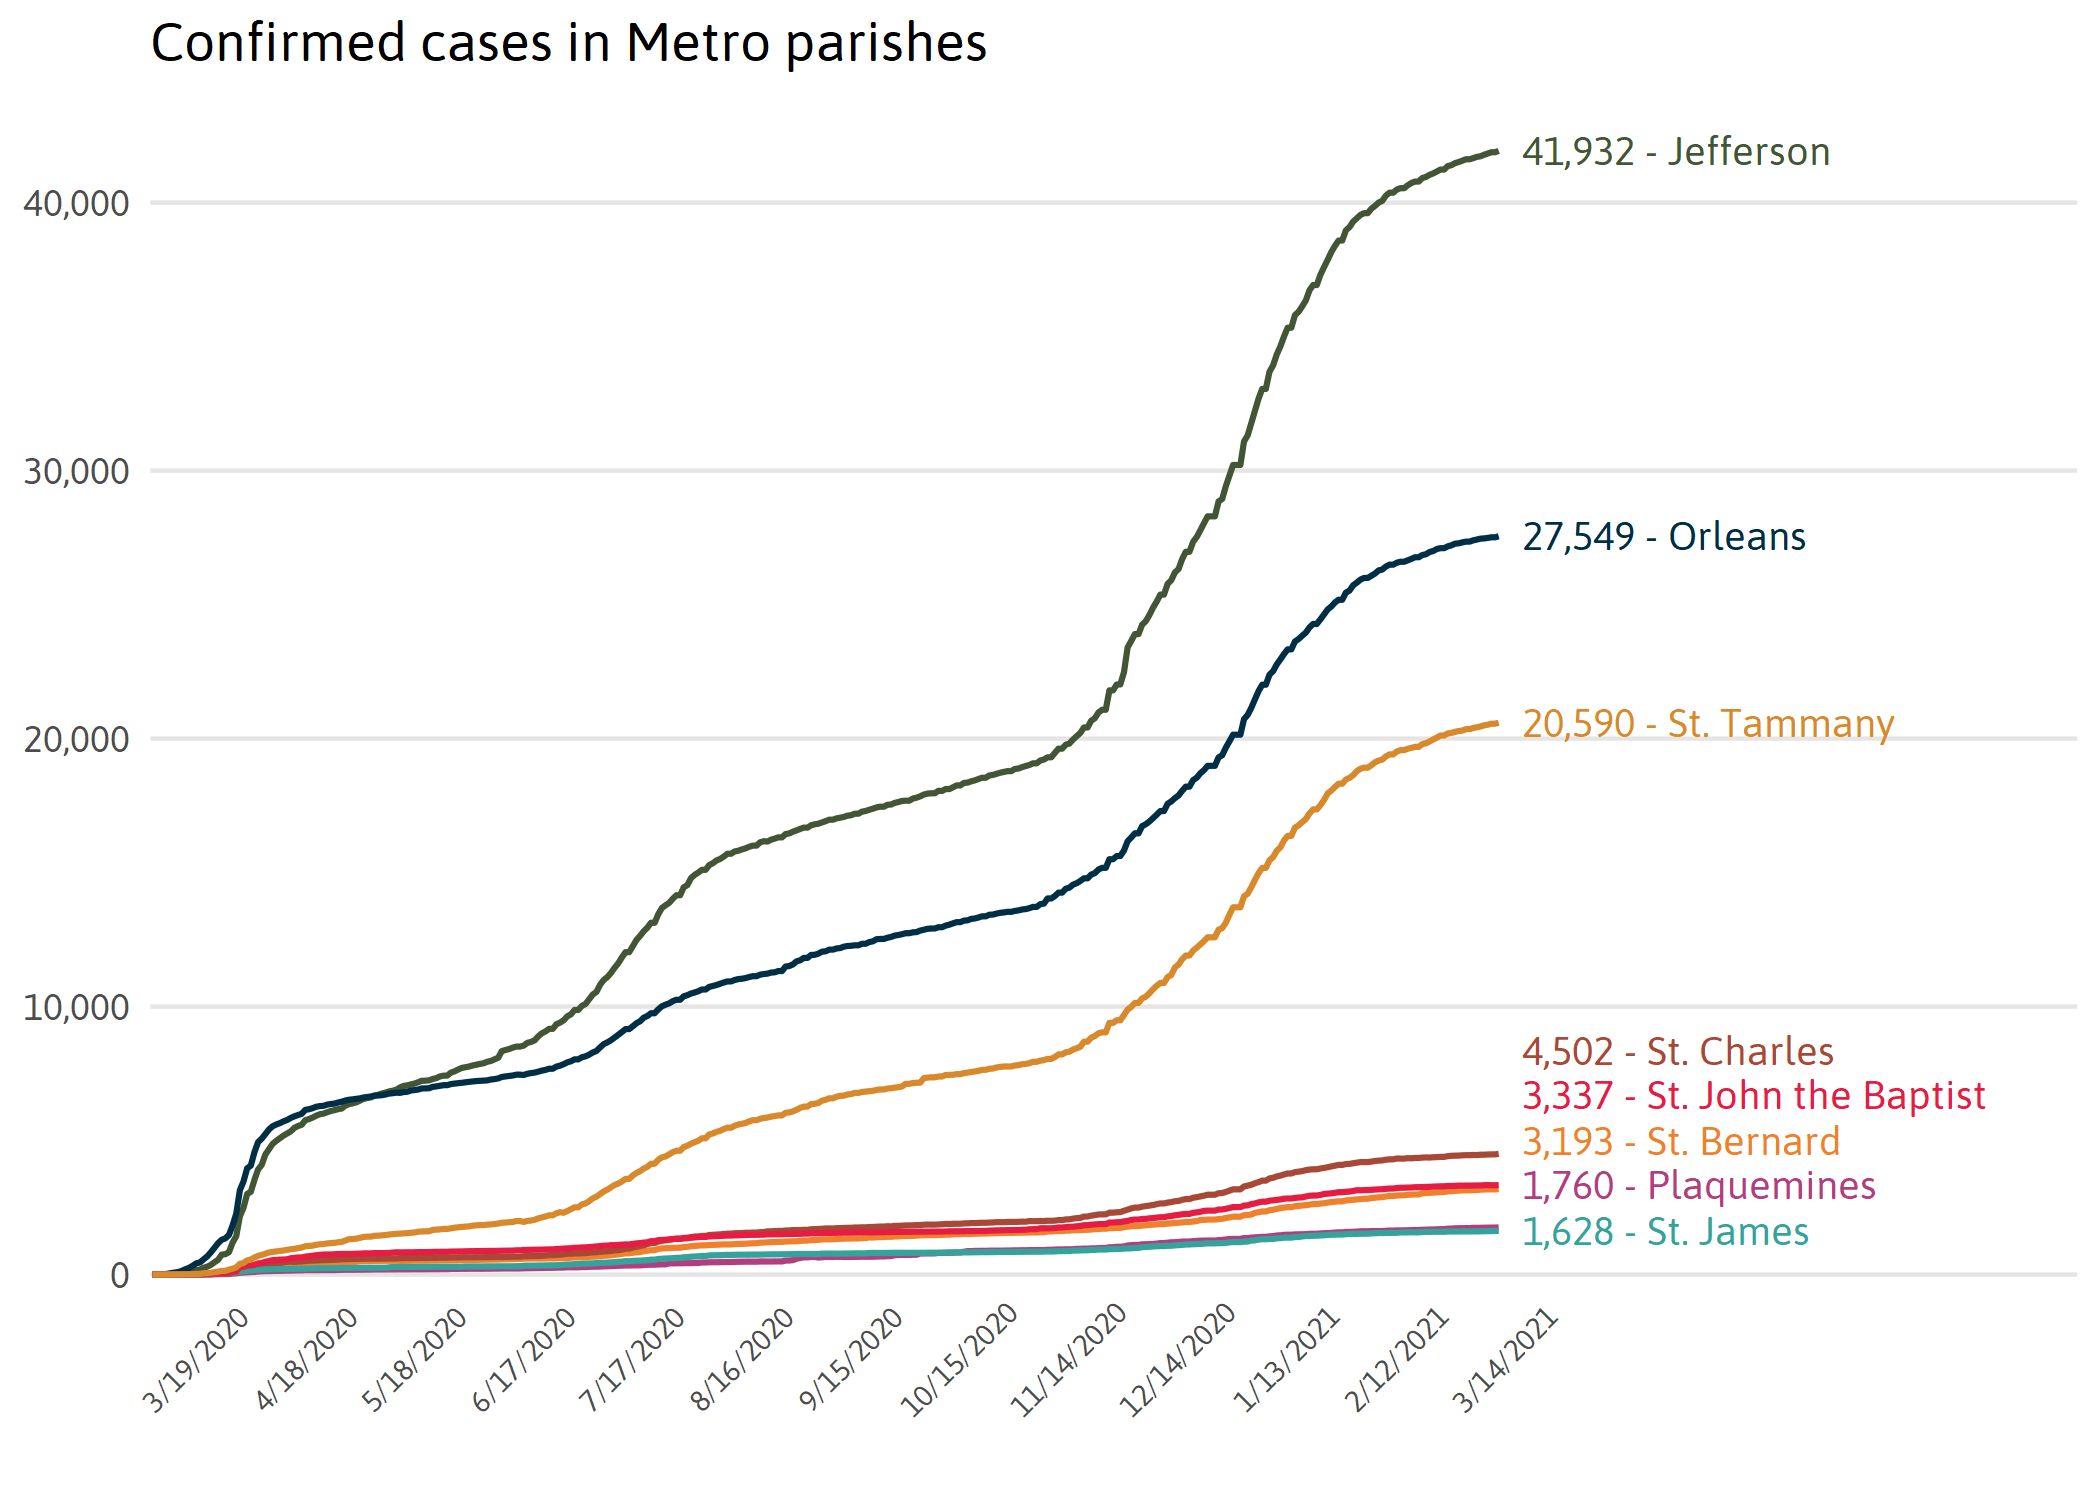 Cases by Metro